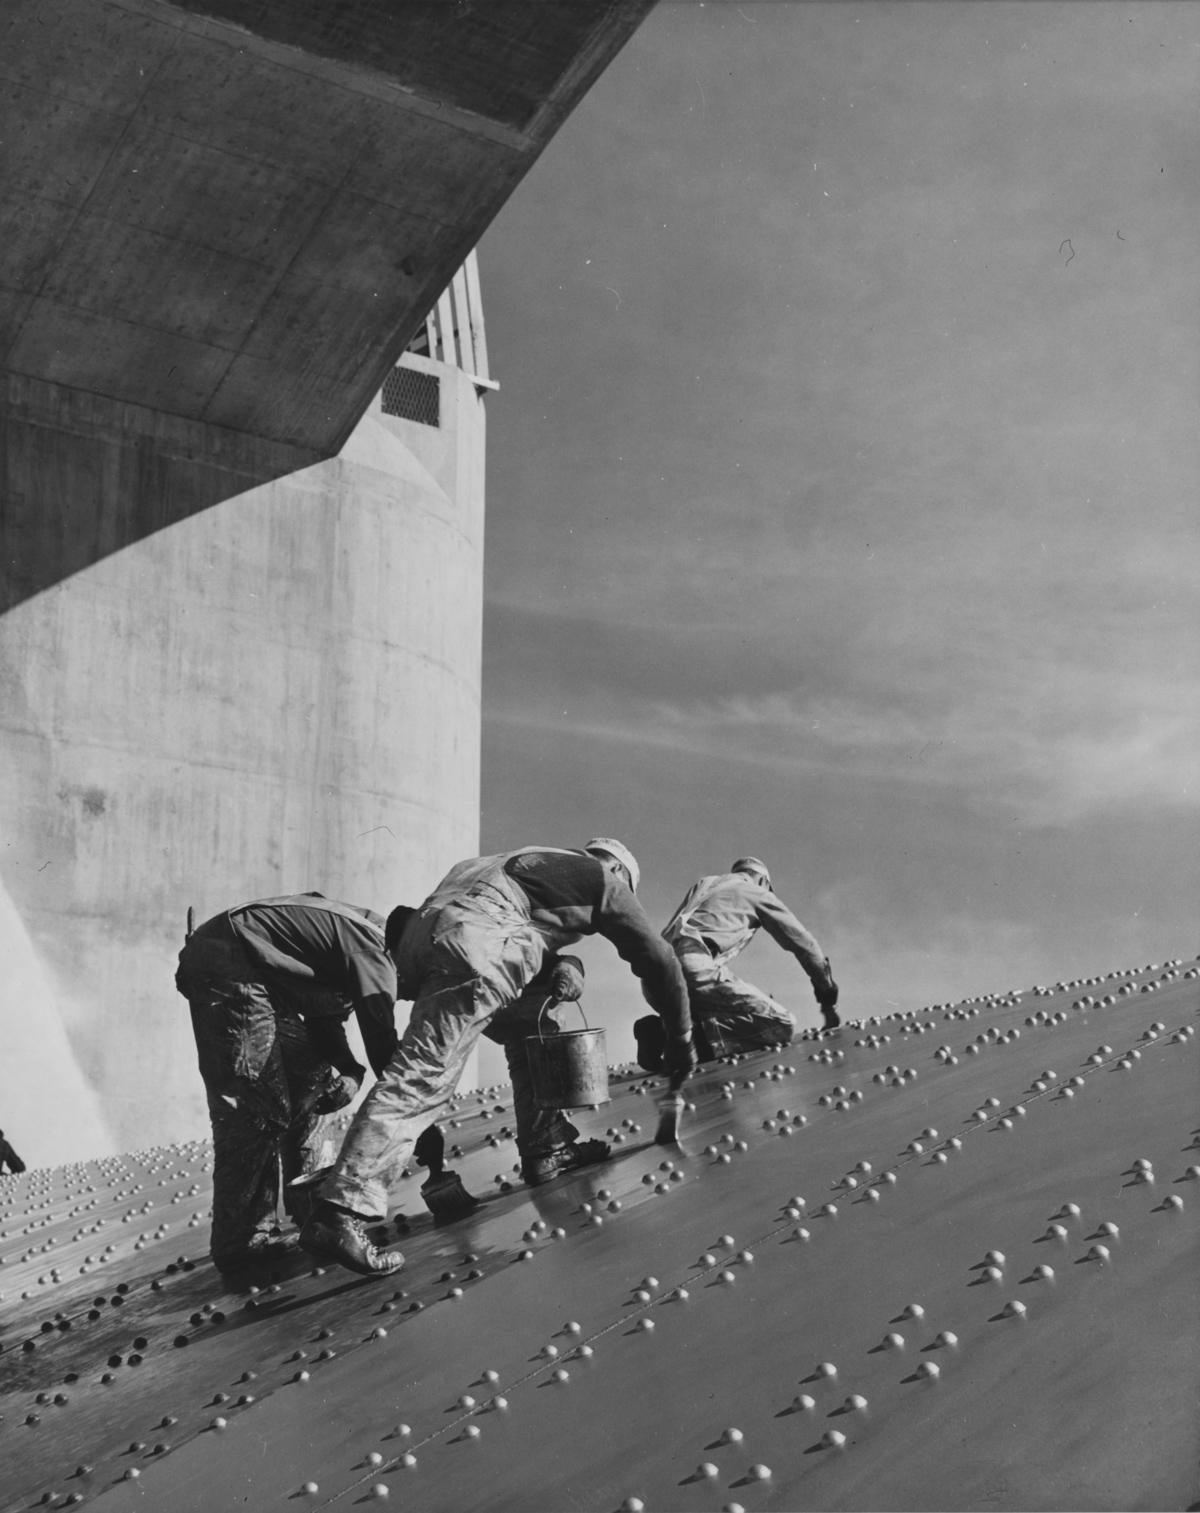 Hoover Dam 23